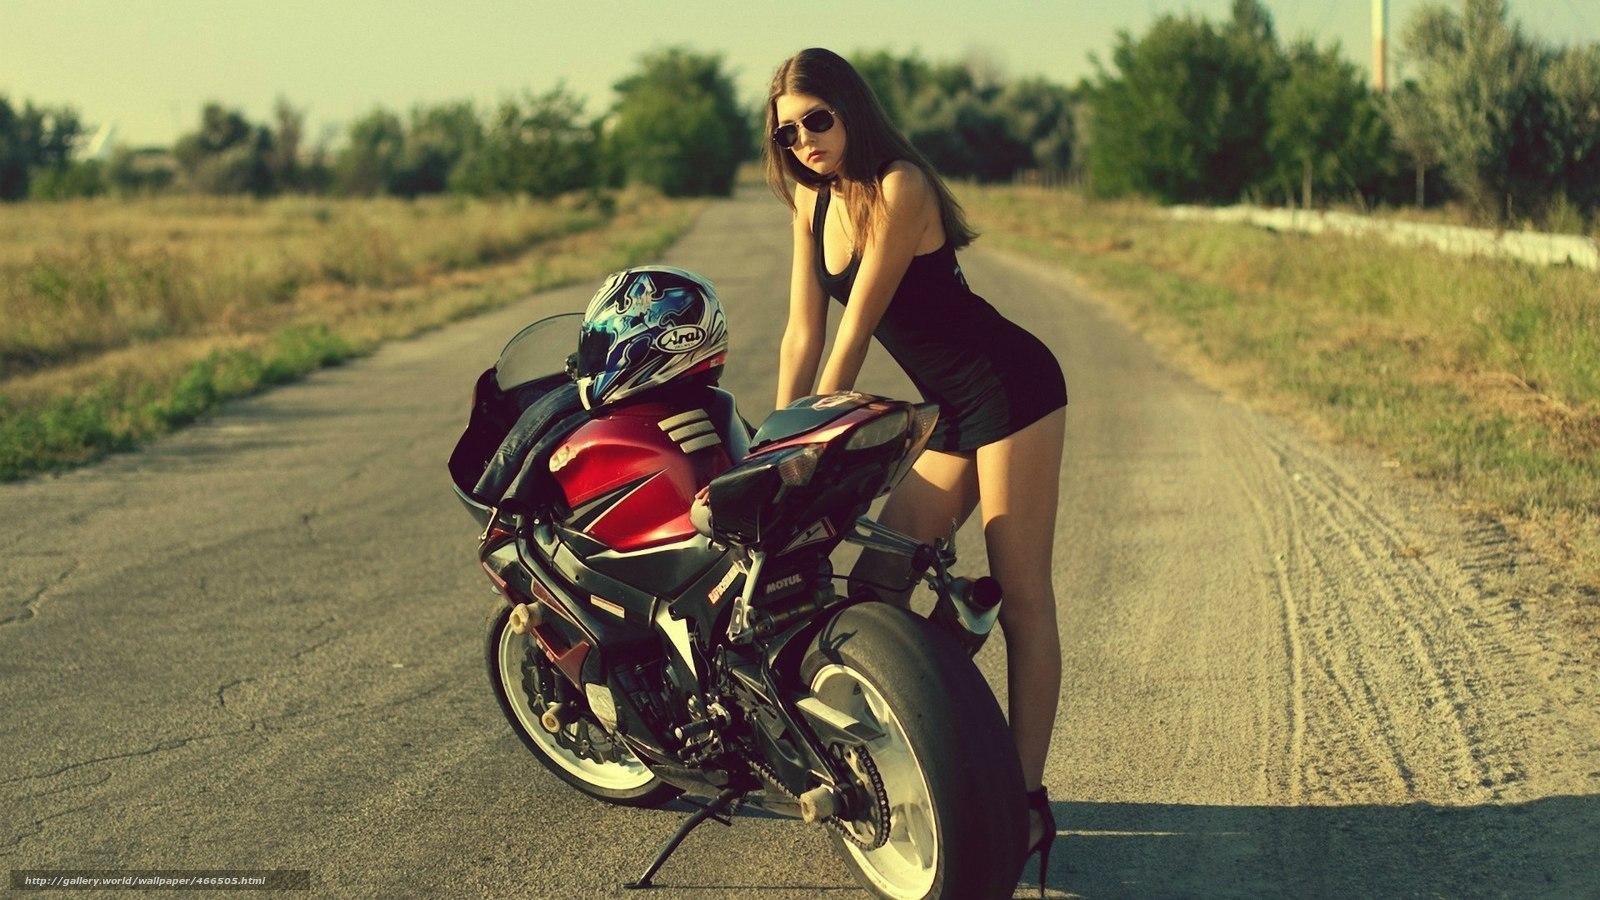 Tlcharger Fond Decran Moto Route Fille Suzuki Fonds